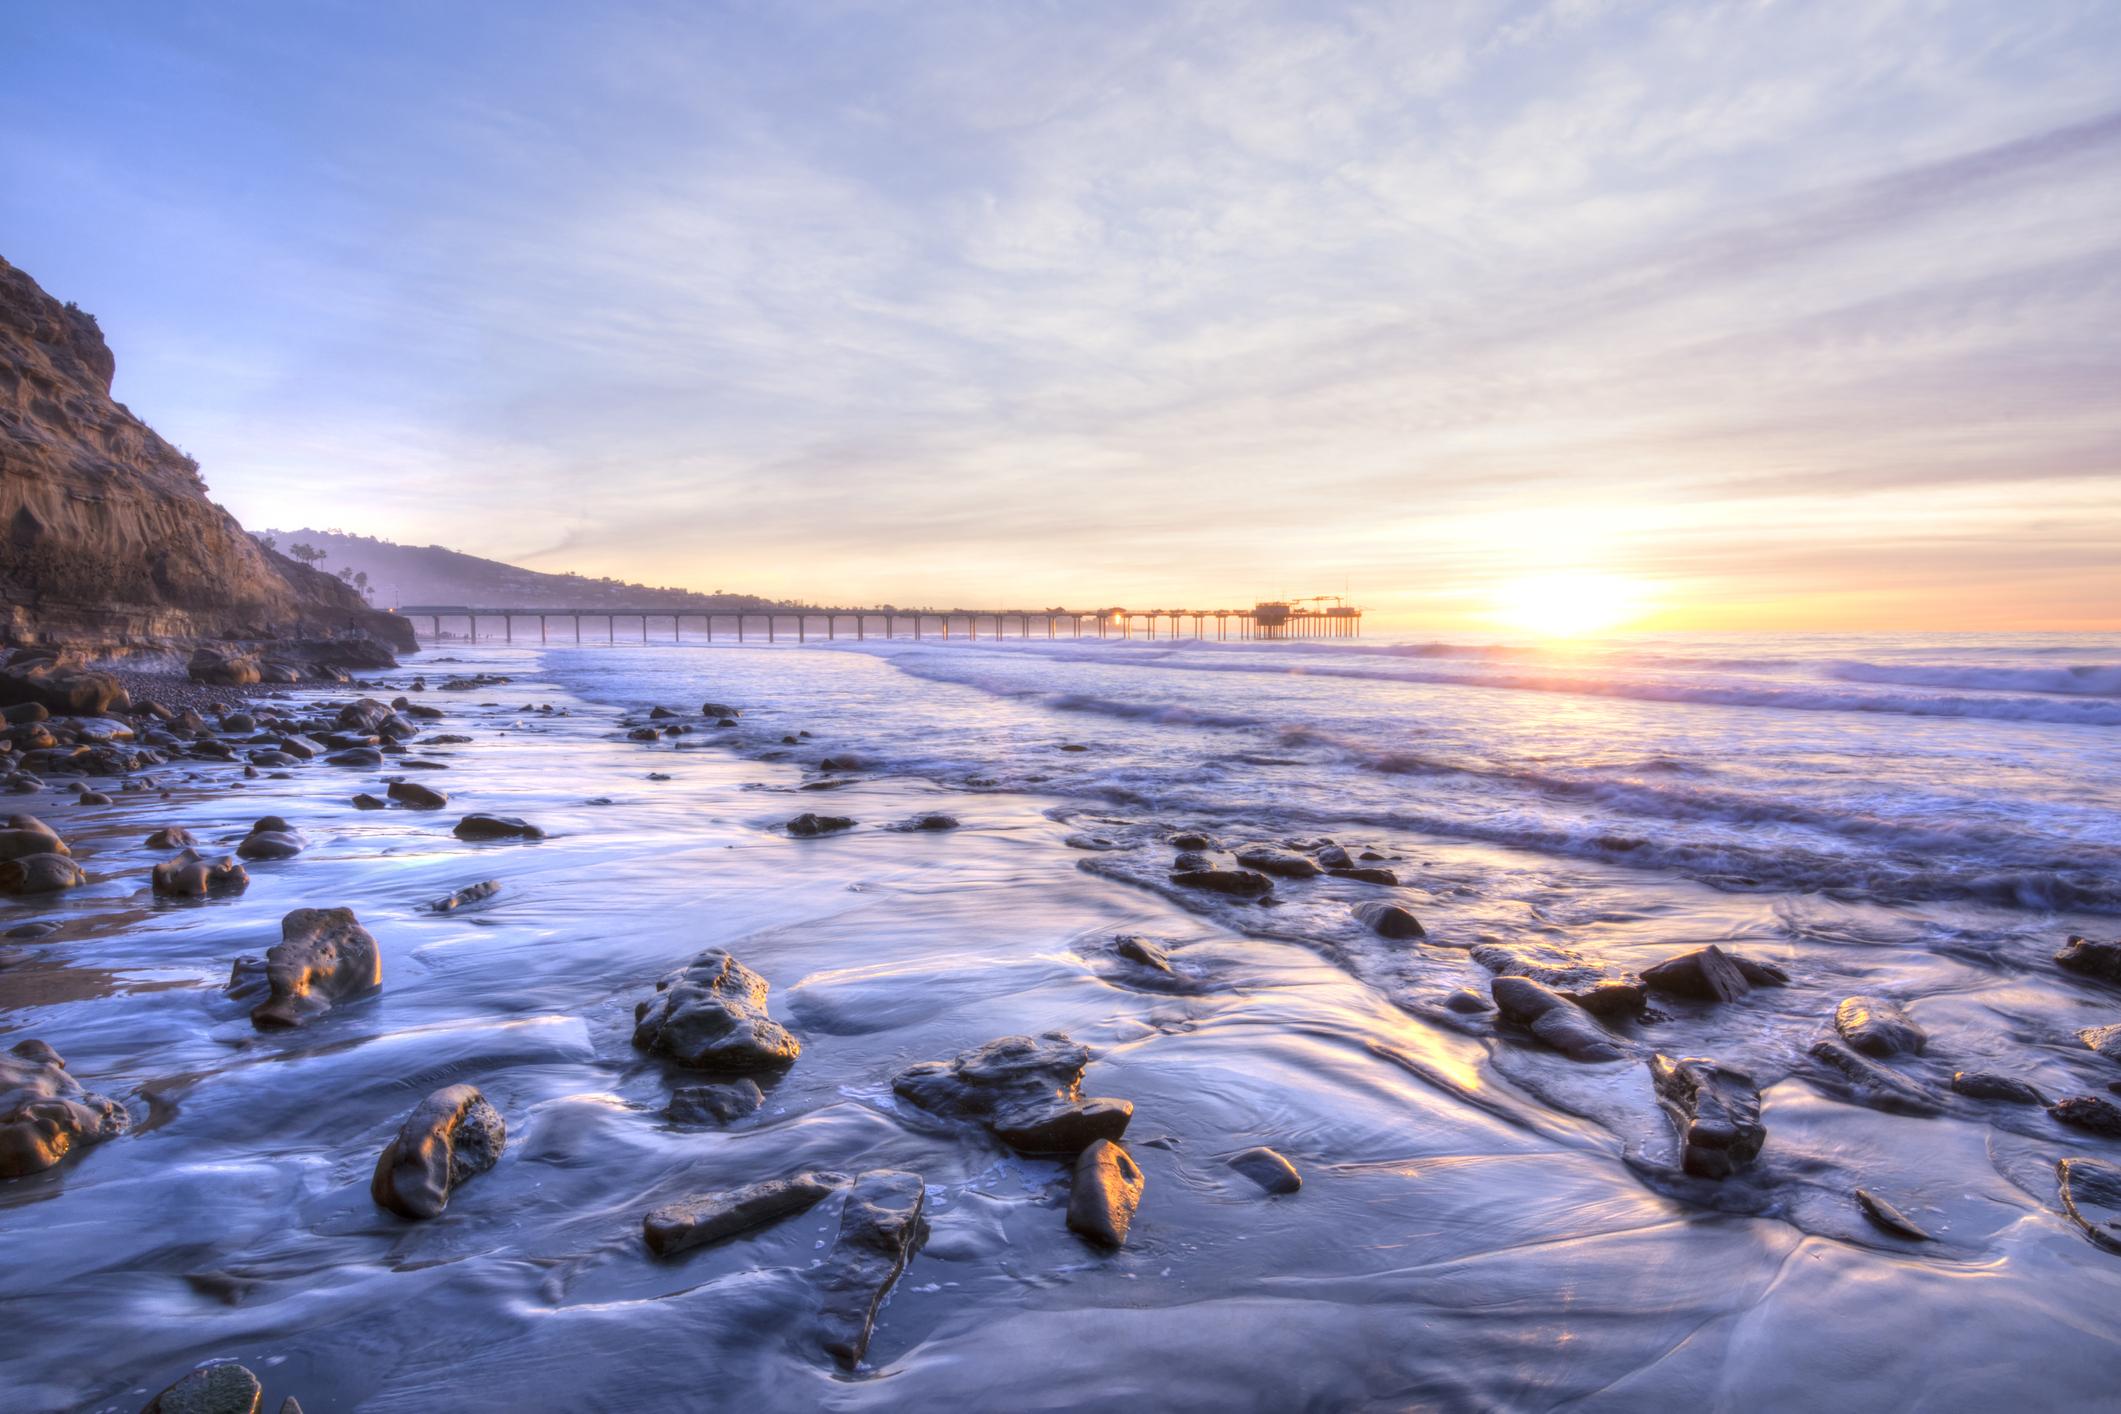 La Jolla Shores beach